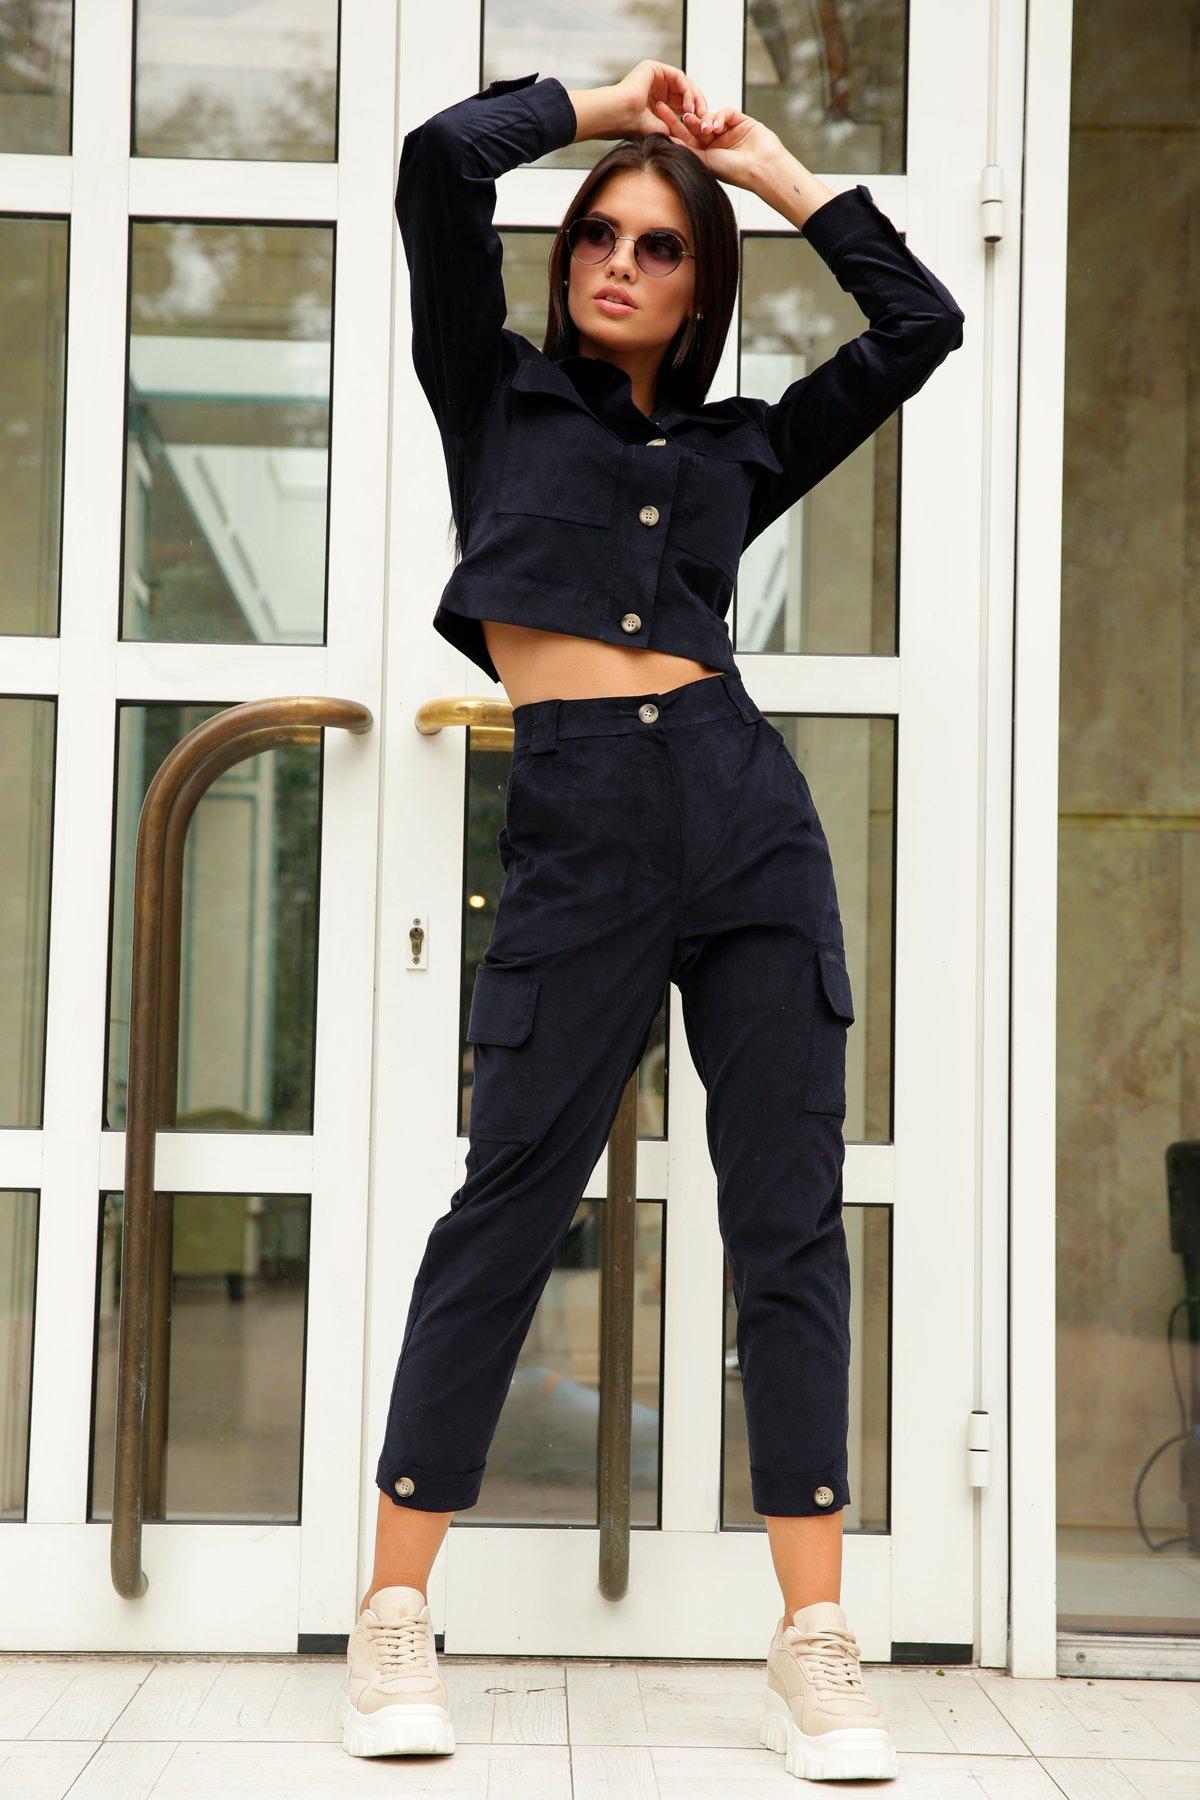 Костюм Дакар 9699 АРТ. 46009 Цвет: т. синий - фото 5, интернет магазин tm-modus.ru